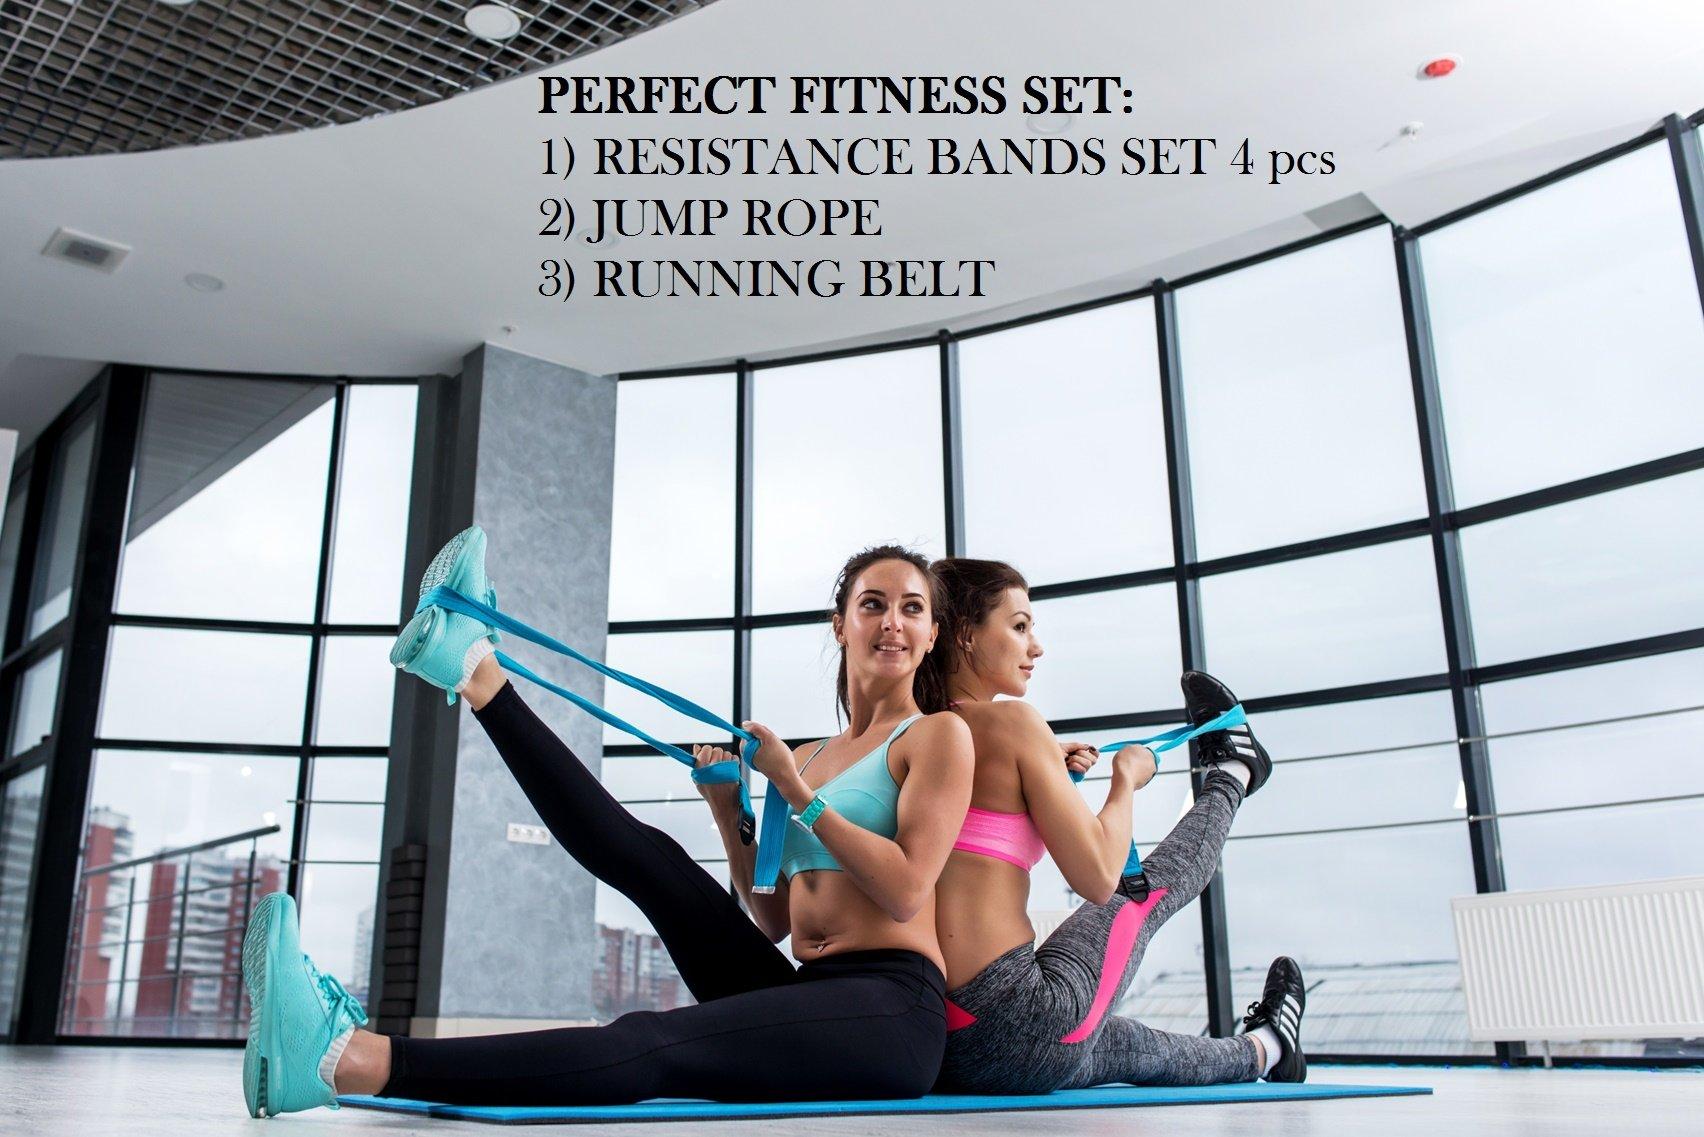 Sportlian Running Belt - Jump Rope - Resistance Bands - Set 3 in 1 for Men Women (Black)